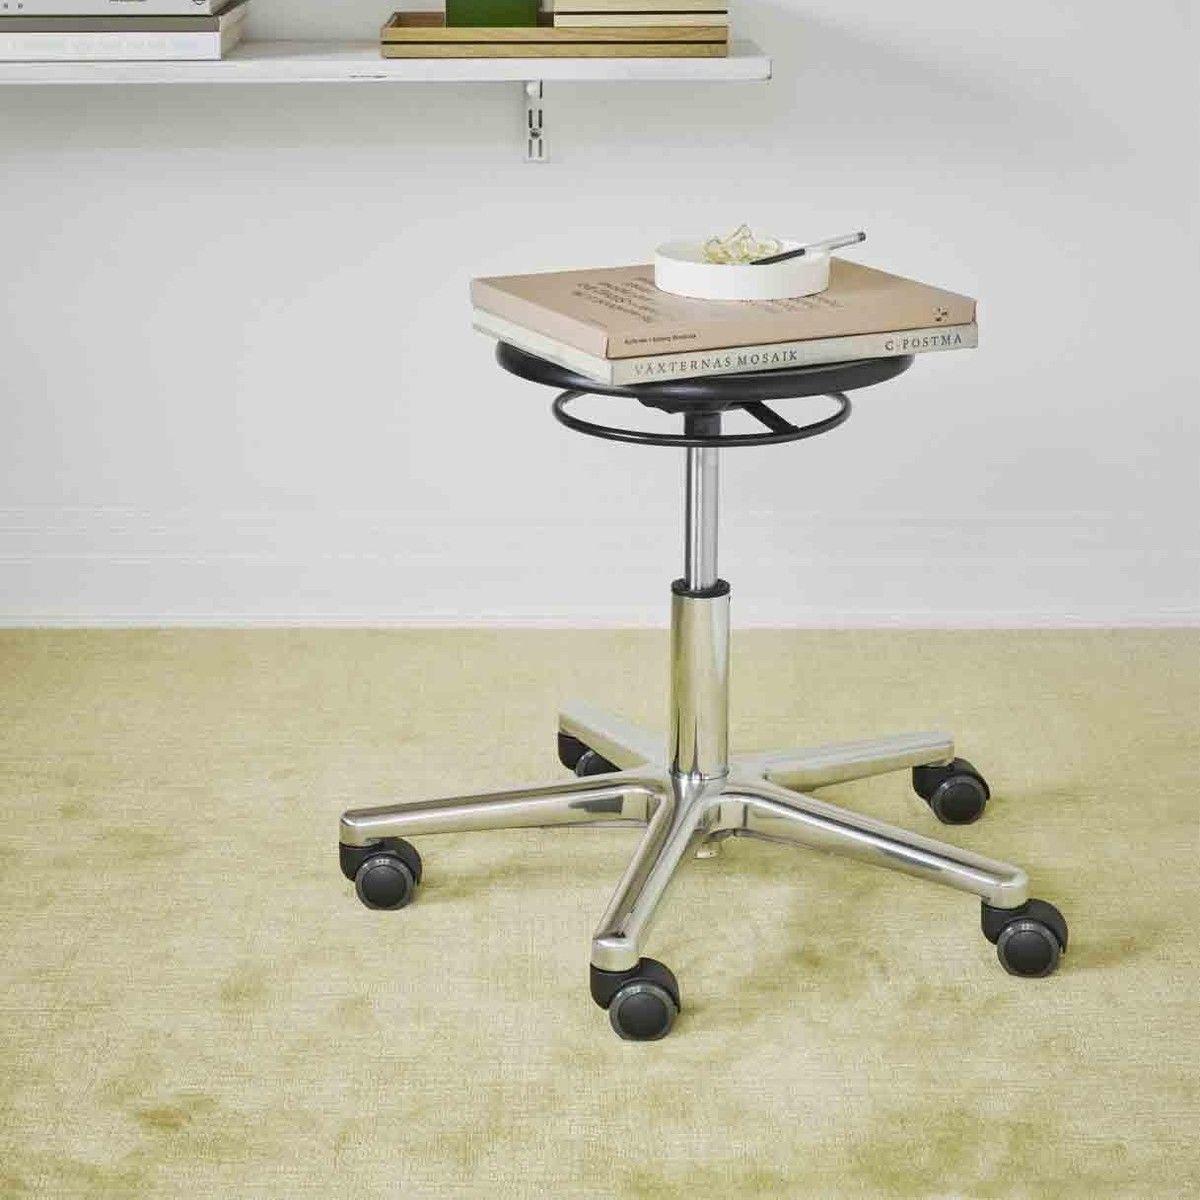 s 193 r drehhocker wilde spieth. Black Bedroom Furniture Sets. Home Design Ideas